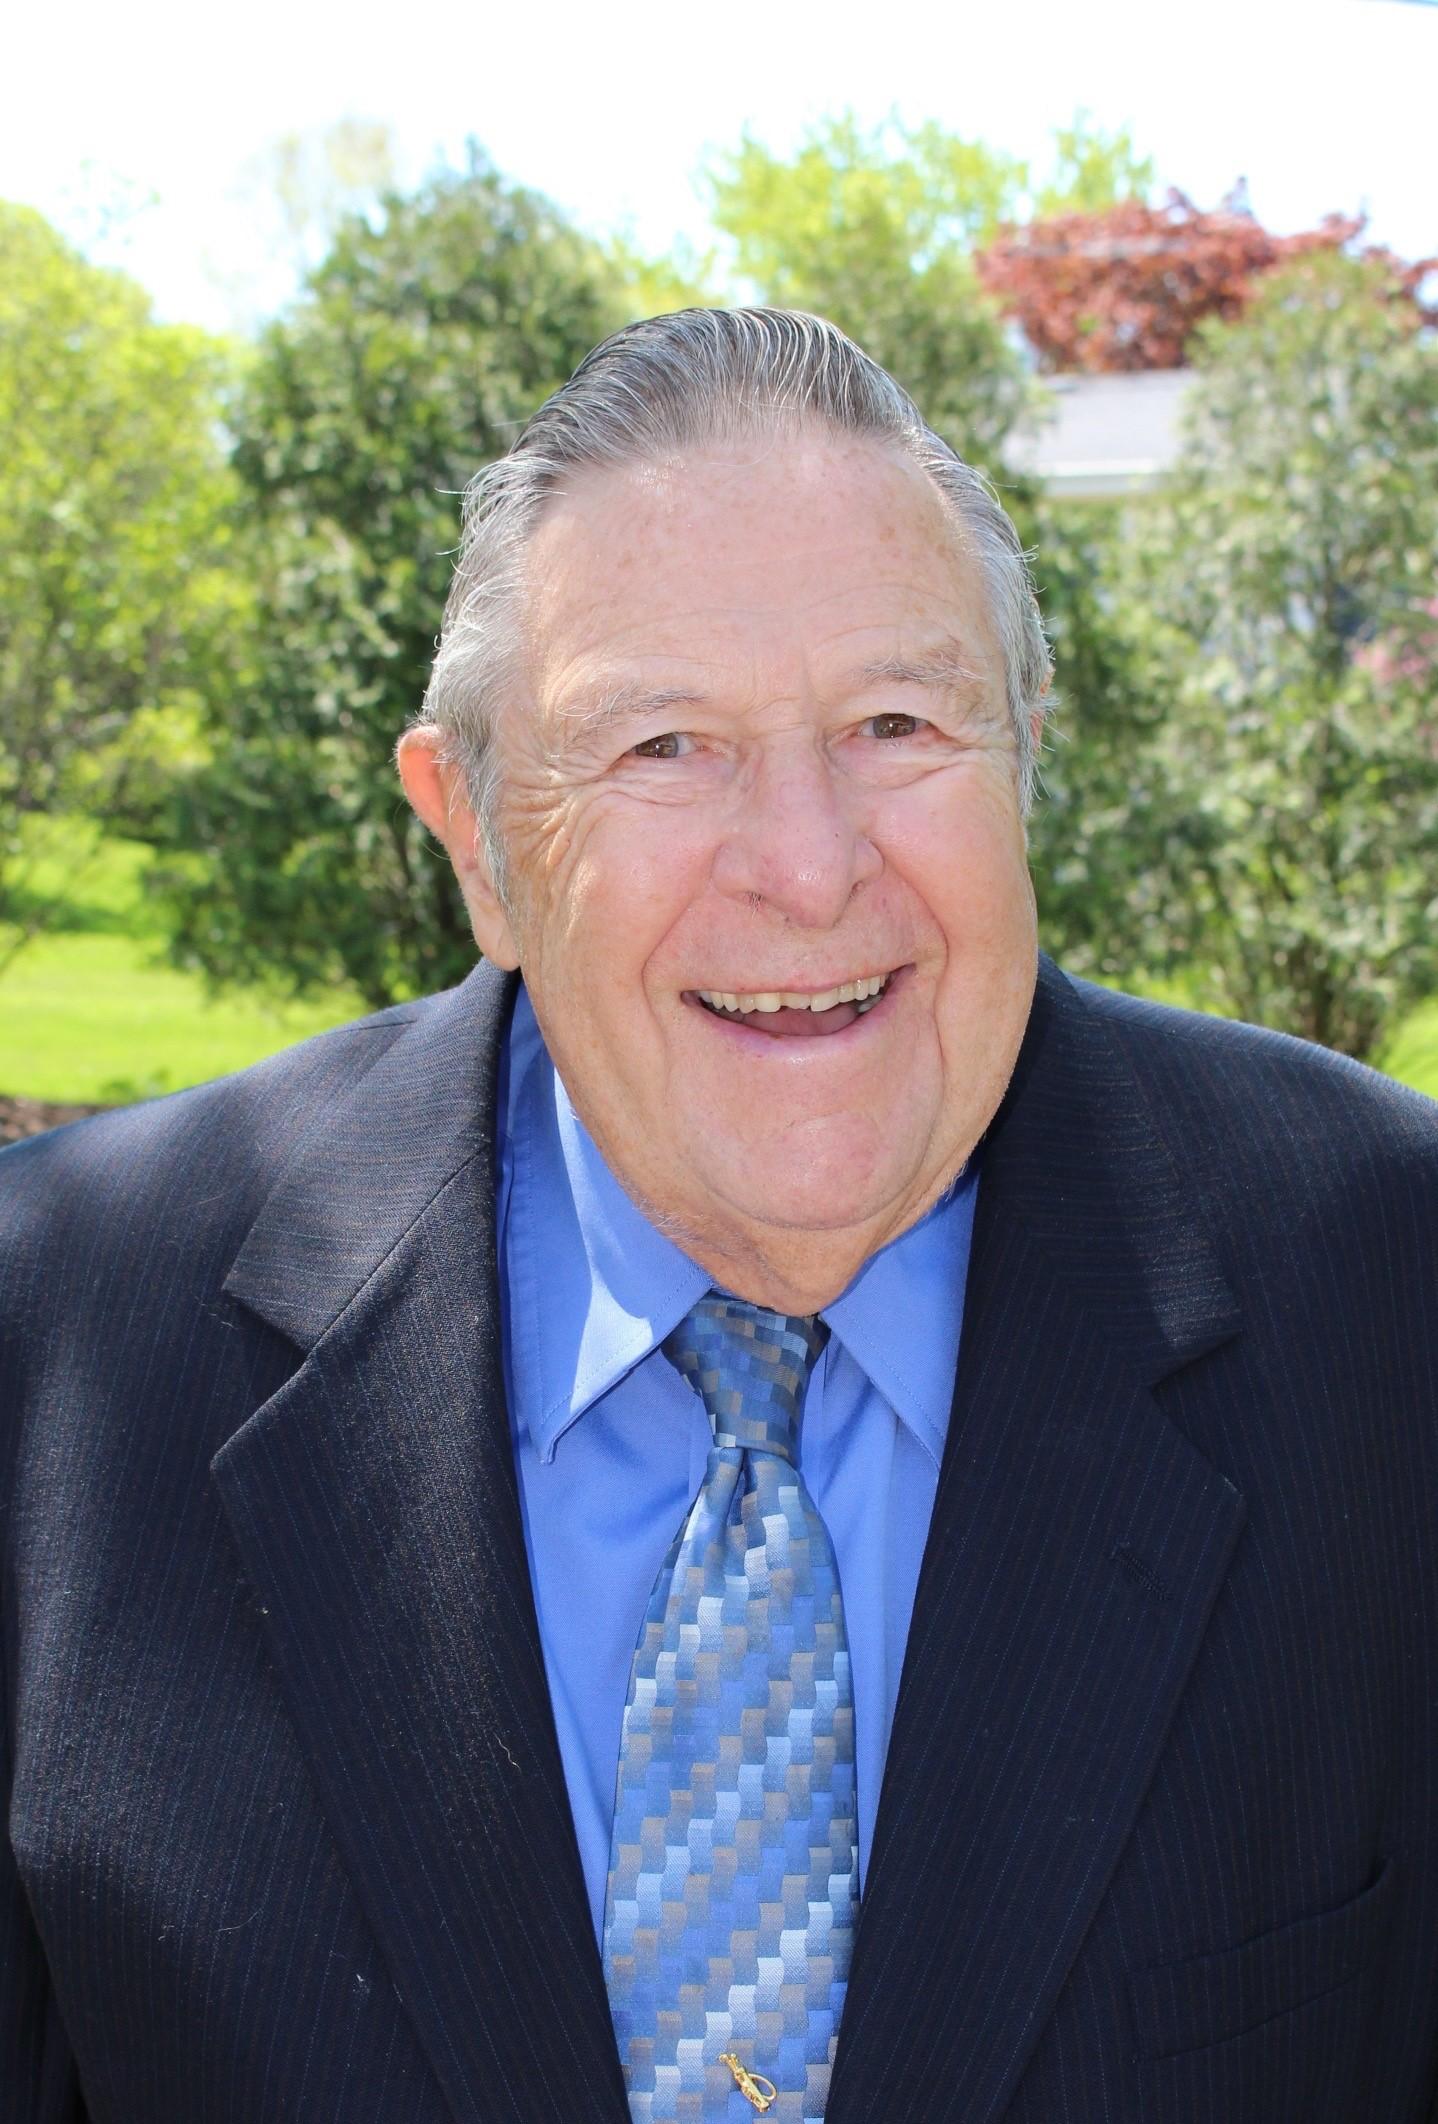 Ronald E. Maassen, Chairman of the Board